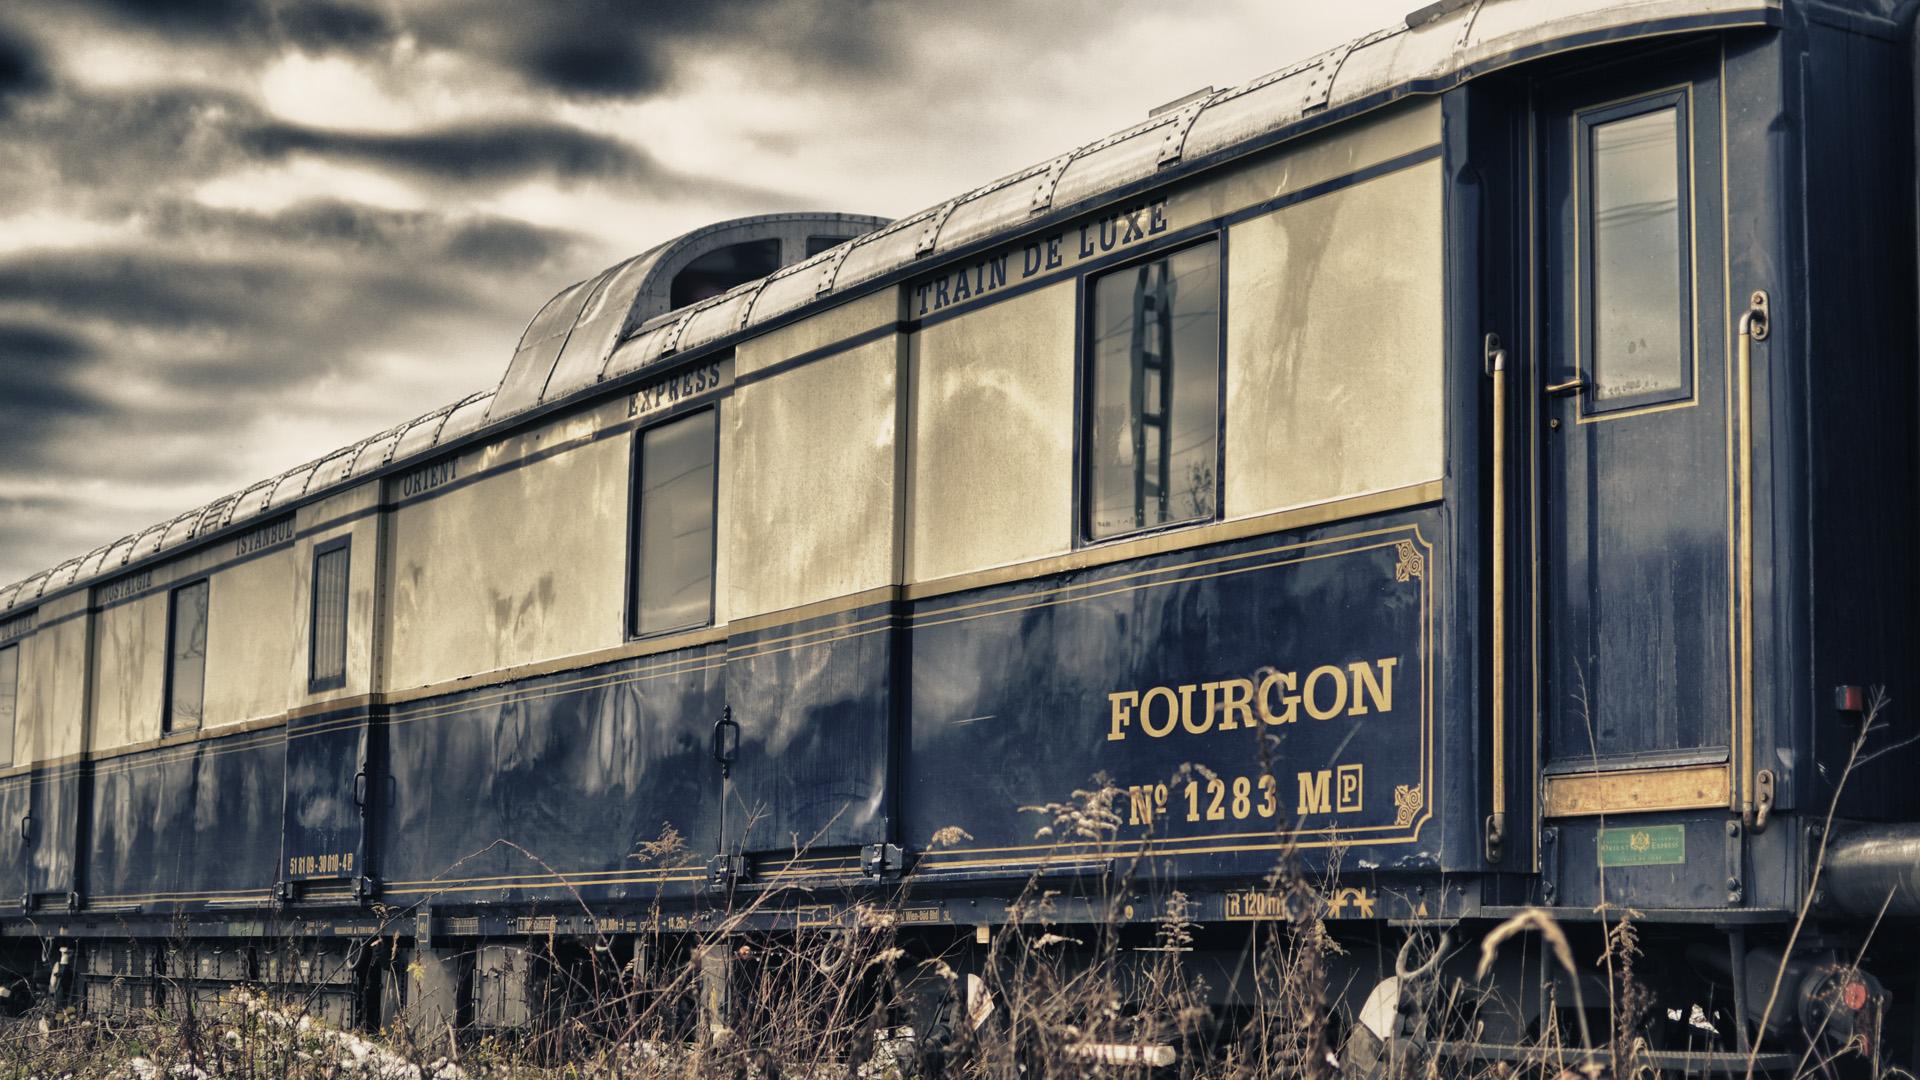 Train de Luxe